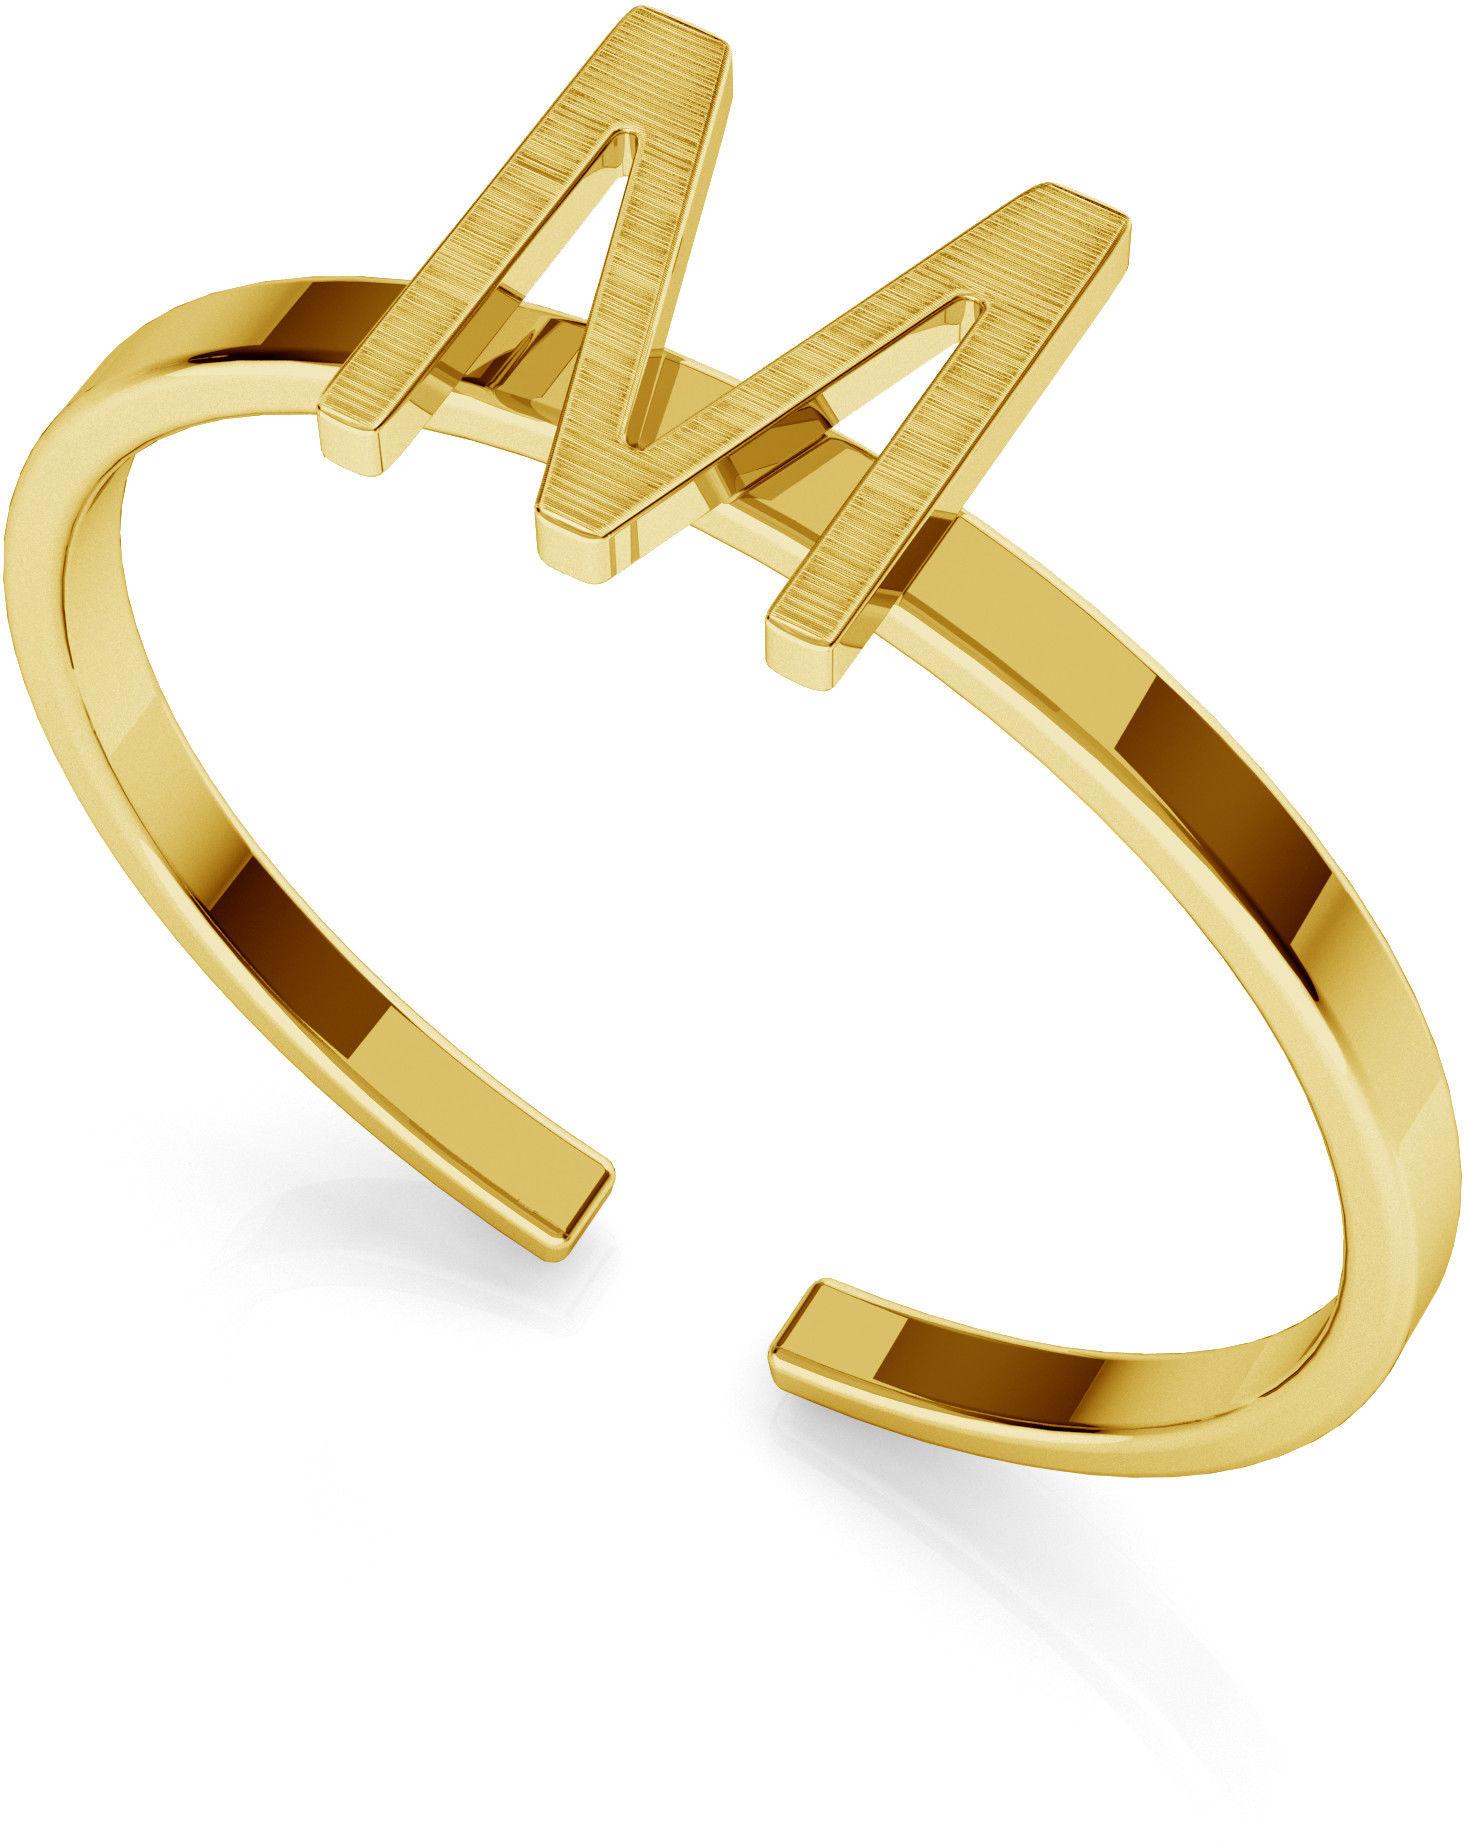 Srebrny pierścionek z literką My RING, srebro 925 : Litera - H, Srebro - kolor pokrycia - Pokrycie platyną